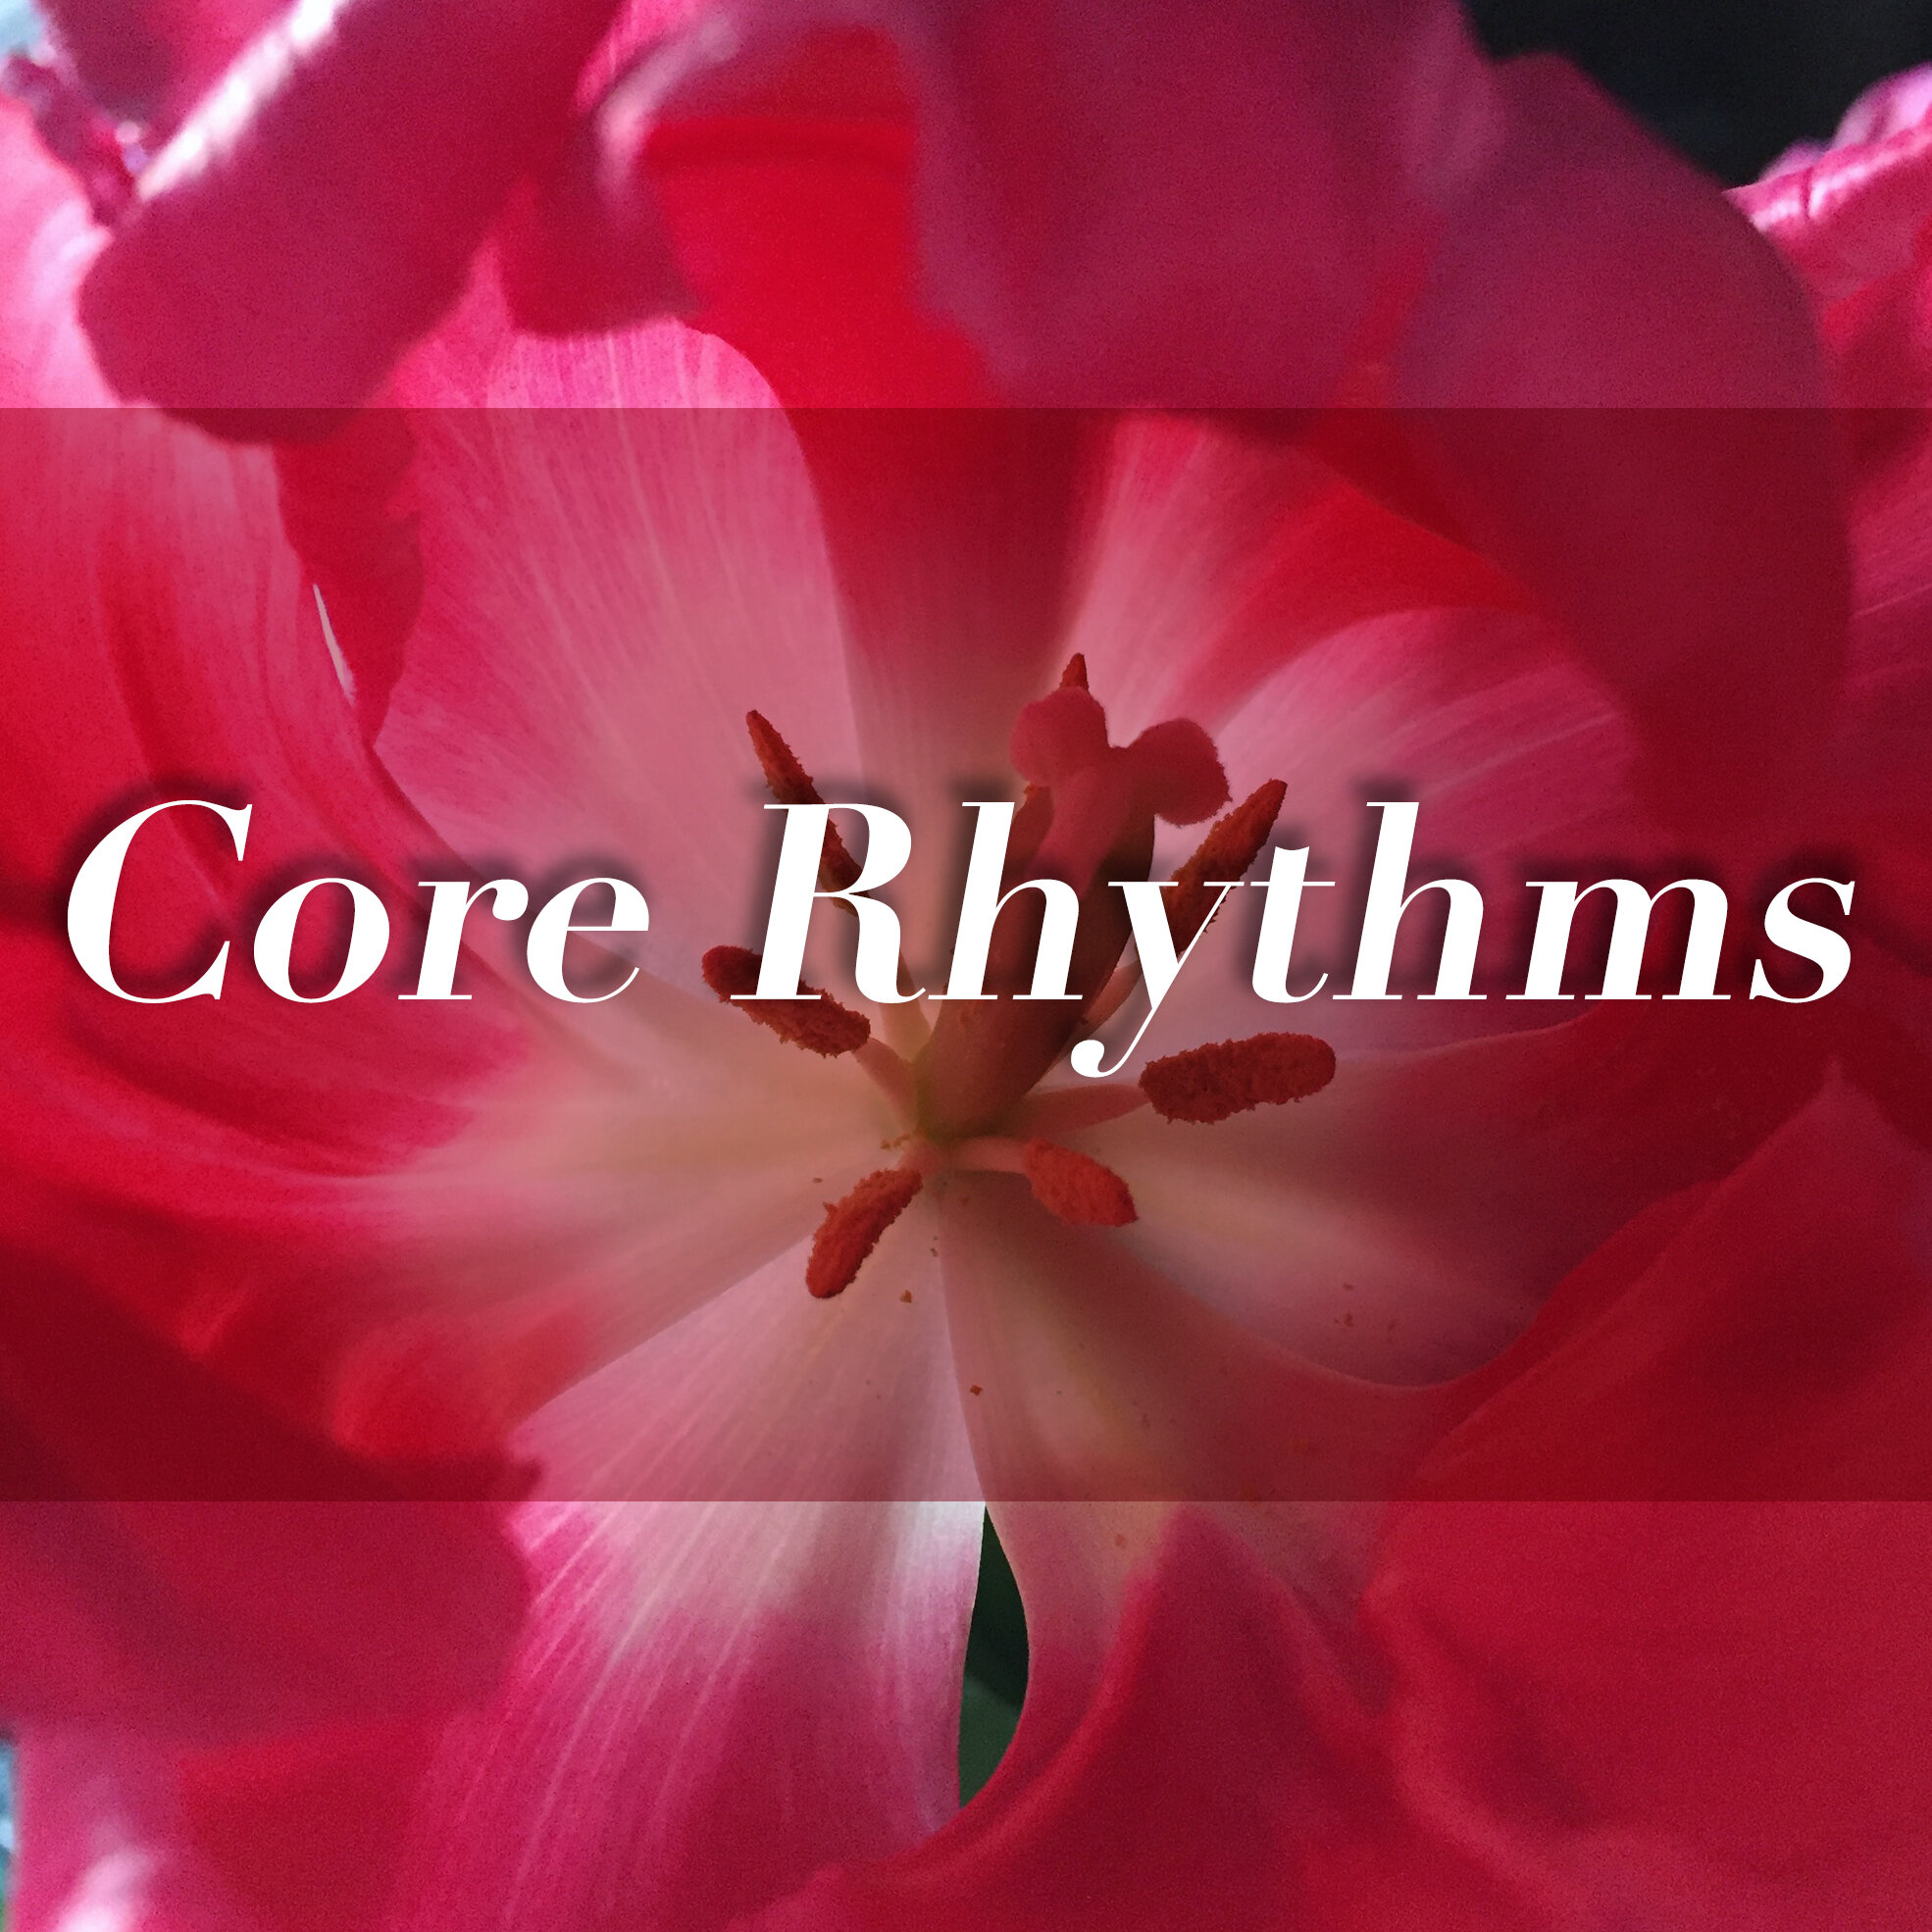 core_rhythms.jpg